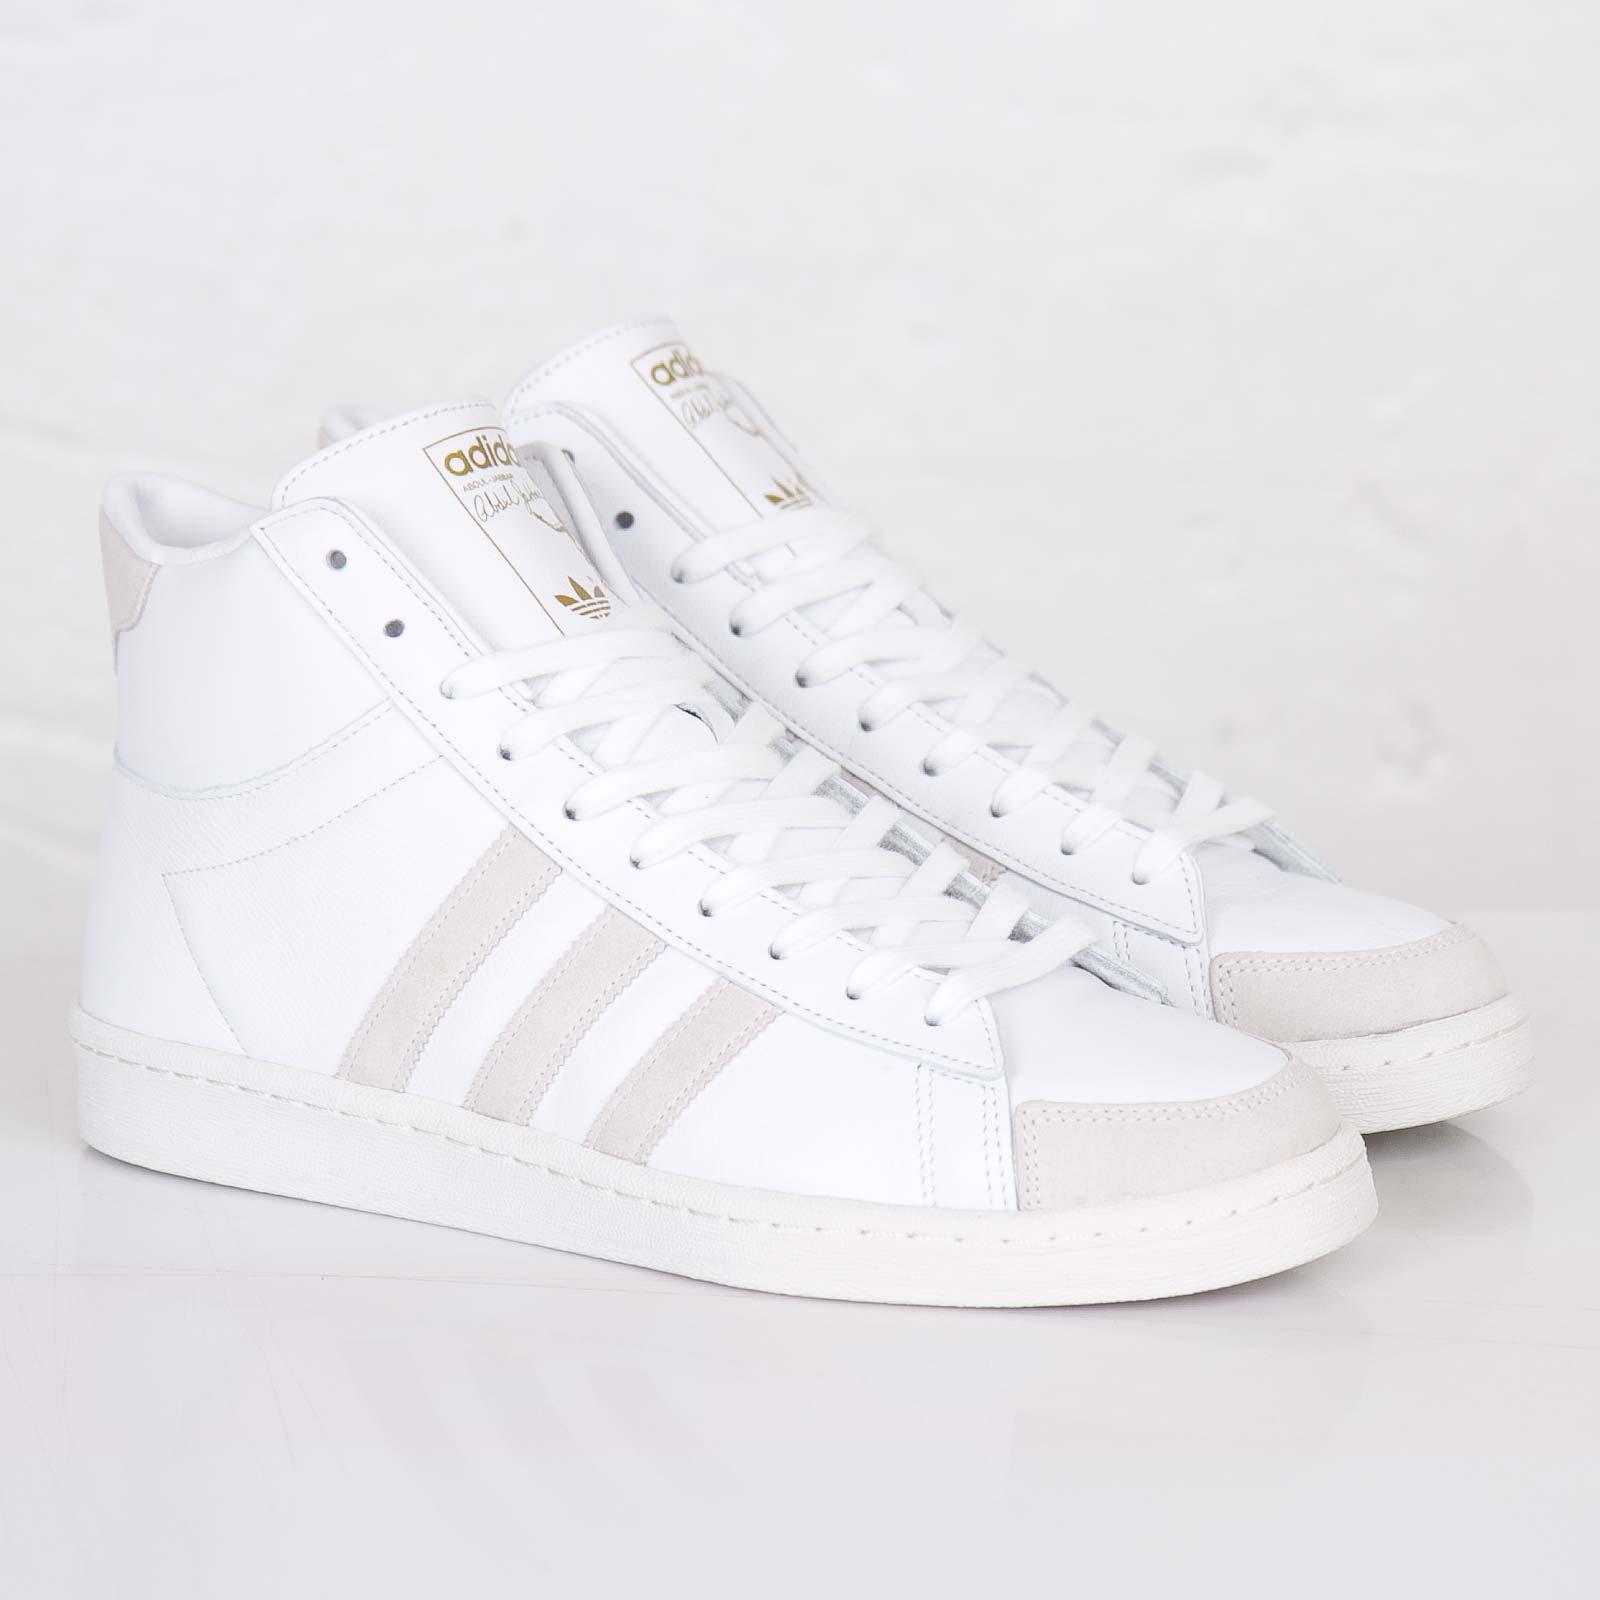 ad2e232b66773a adidas Jabbar Mid - M22773 - Sneakersnstuff